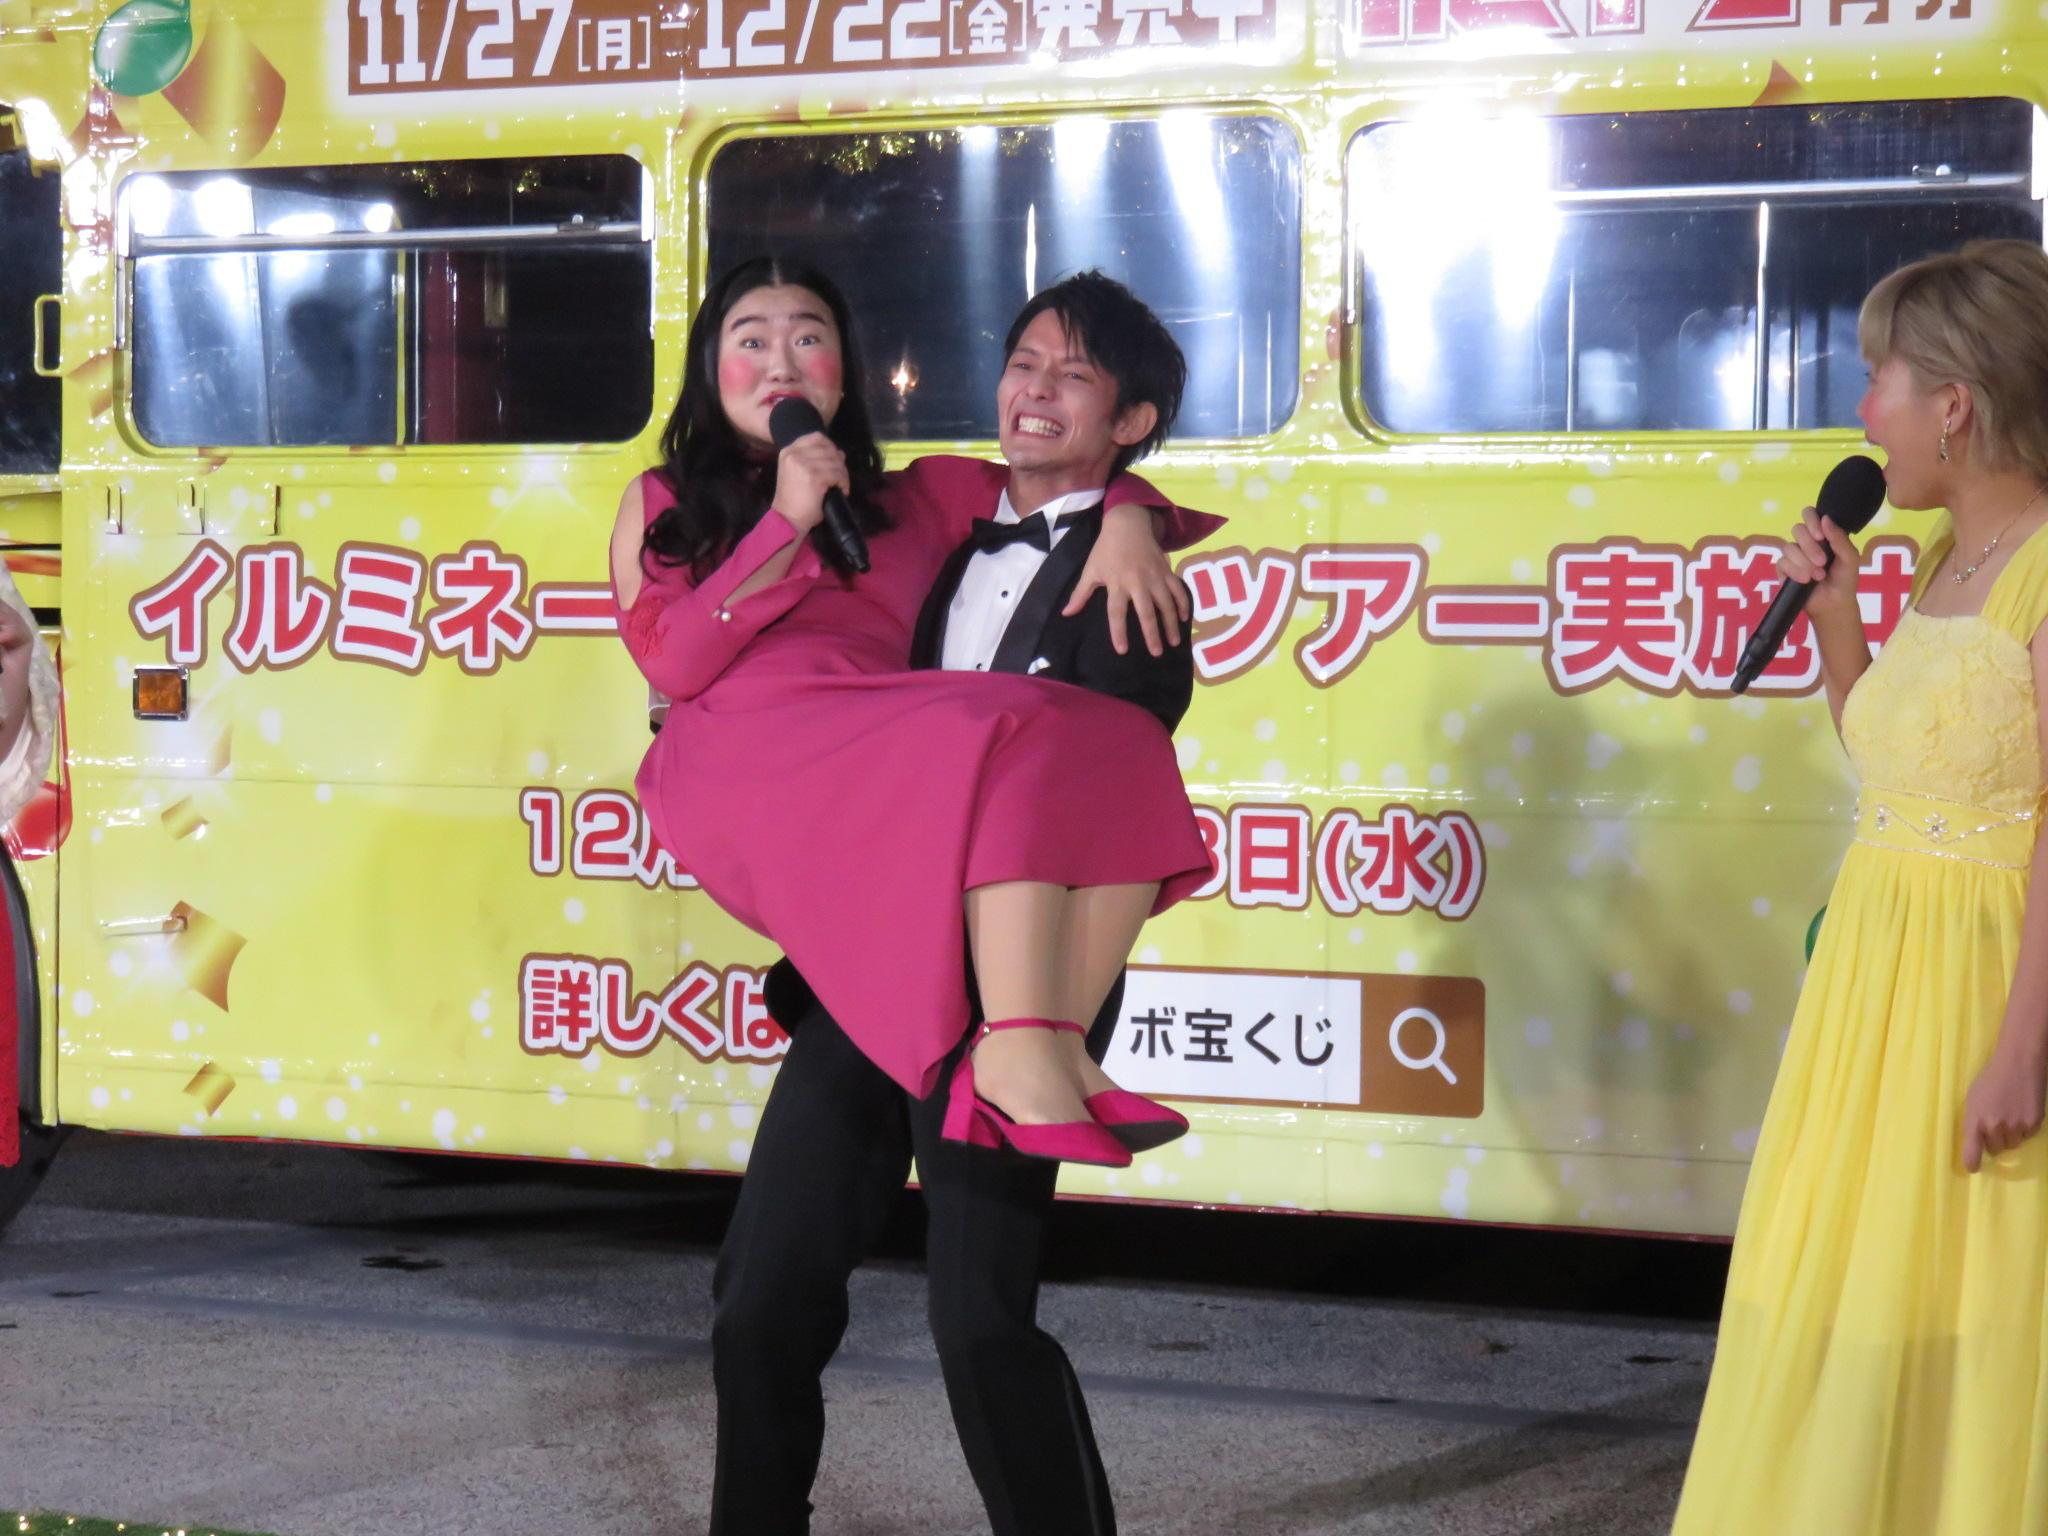 http://news.yoshimoto.co.jp/20171206224246-397c6496058878e62af92867b0e4a0a157ecd06d.jpg